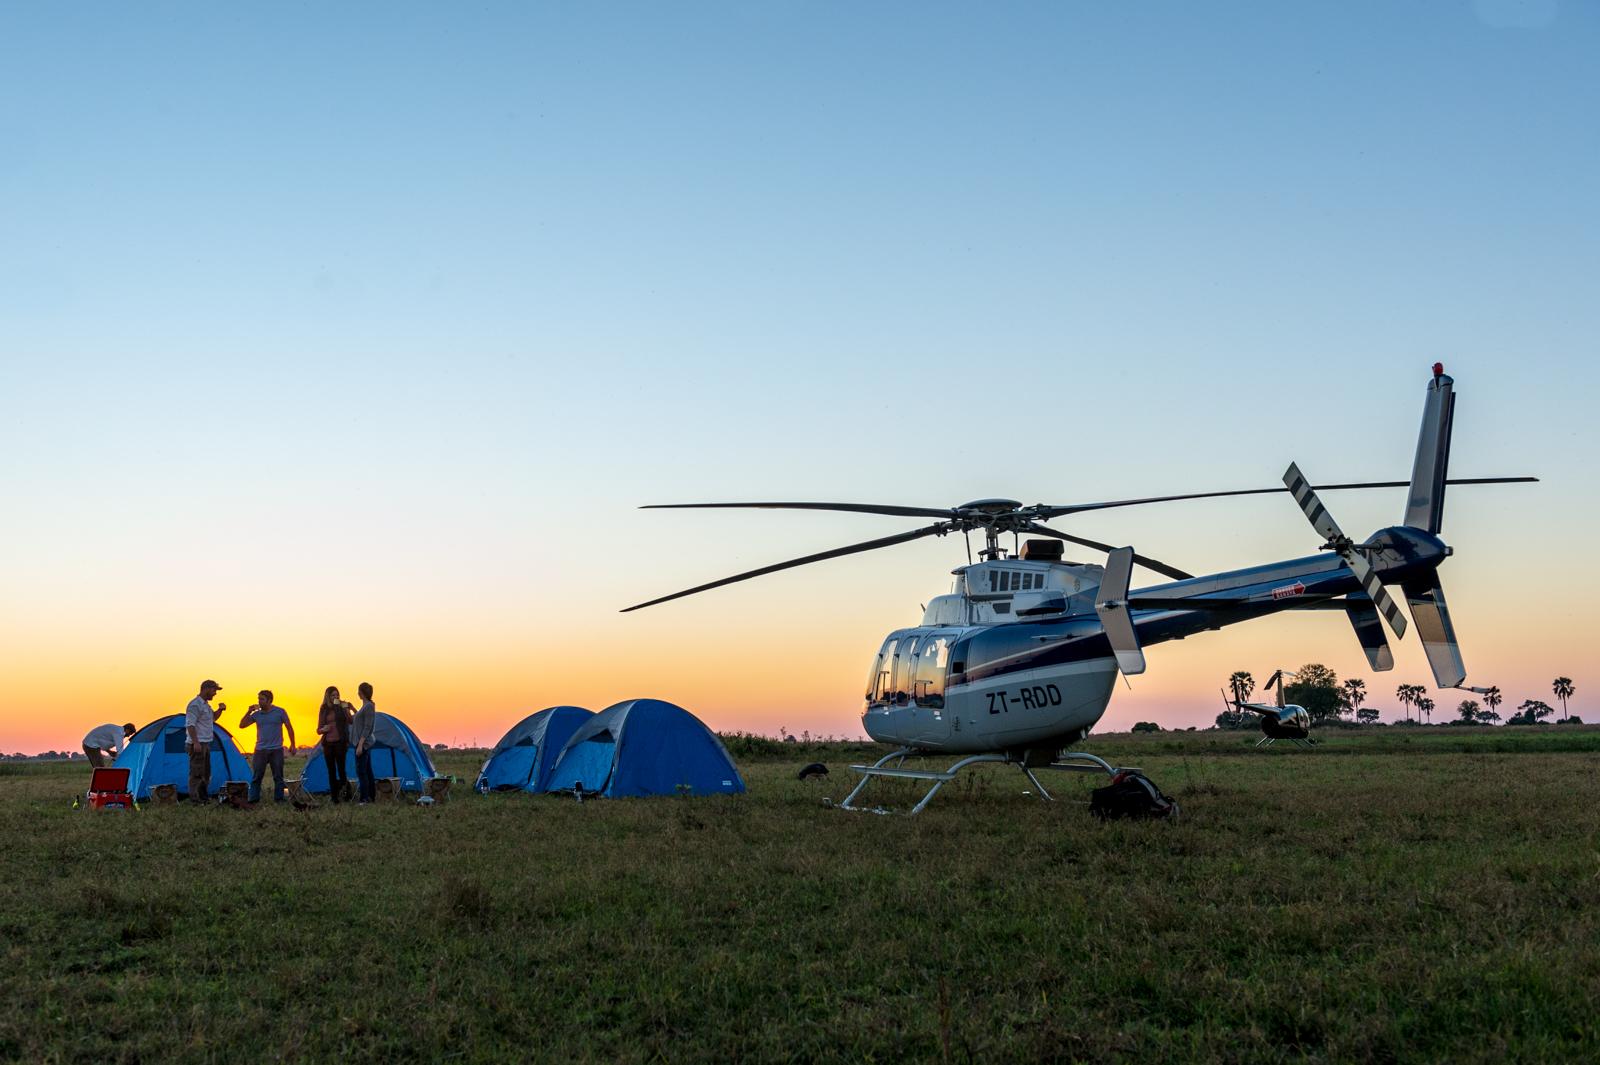 social_helicopterhorizons_botswana_cwww.marcstickler.at370.jpg